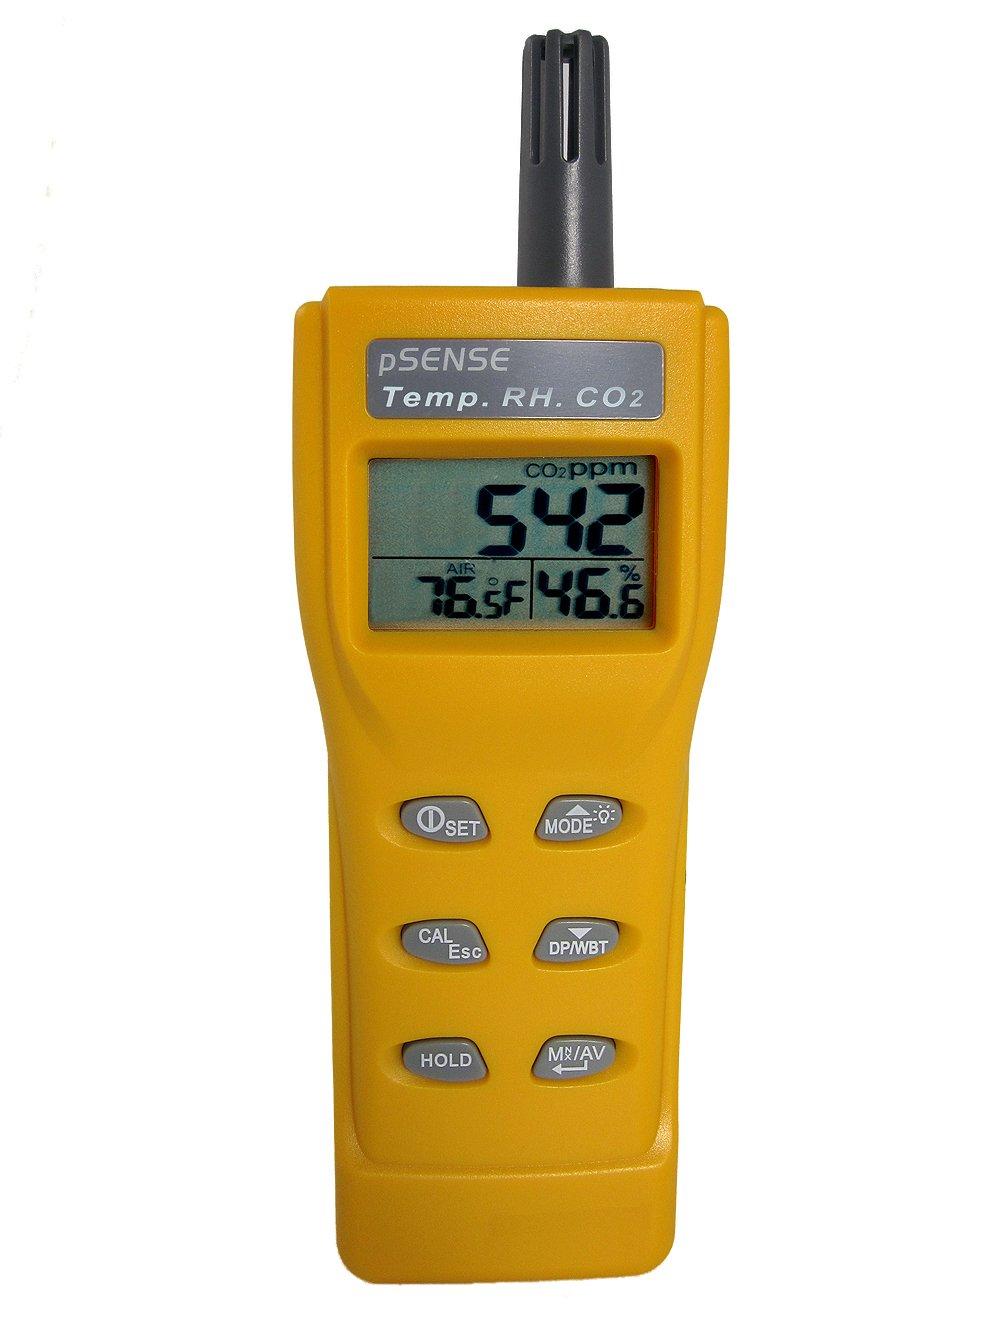 CO2Meter AZ-0001 pSense Portable CO2 Indoor Air Quality Meter, Yellow